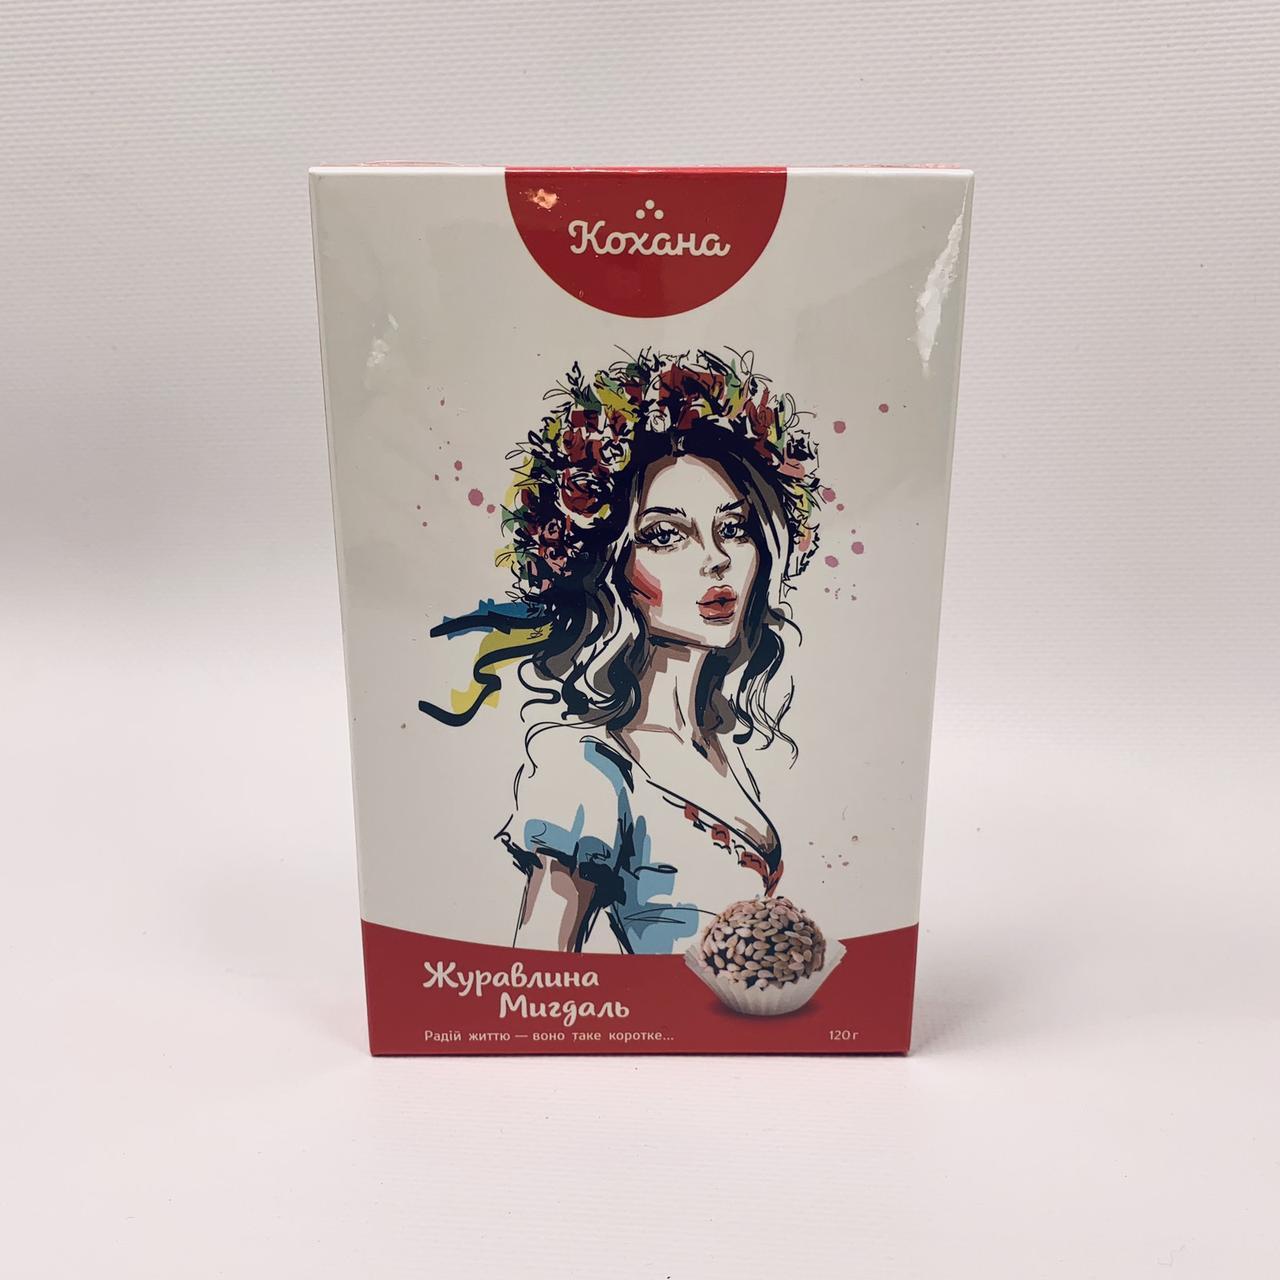 "Натуральные конфеты КОХАНА ""Клюква-миндаль"" (без сахара), 120 г"